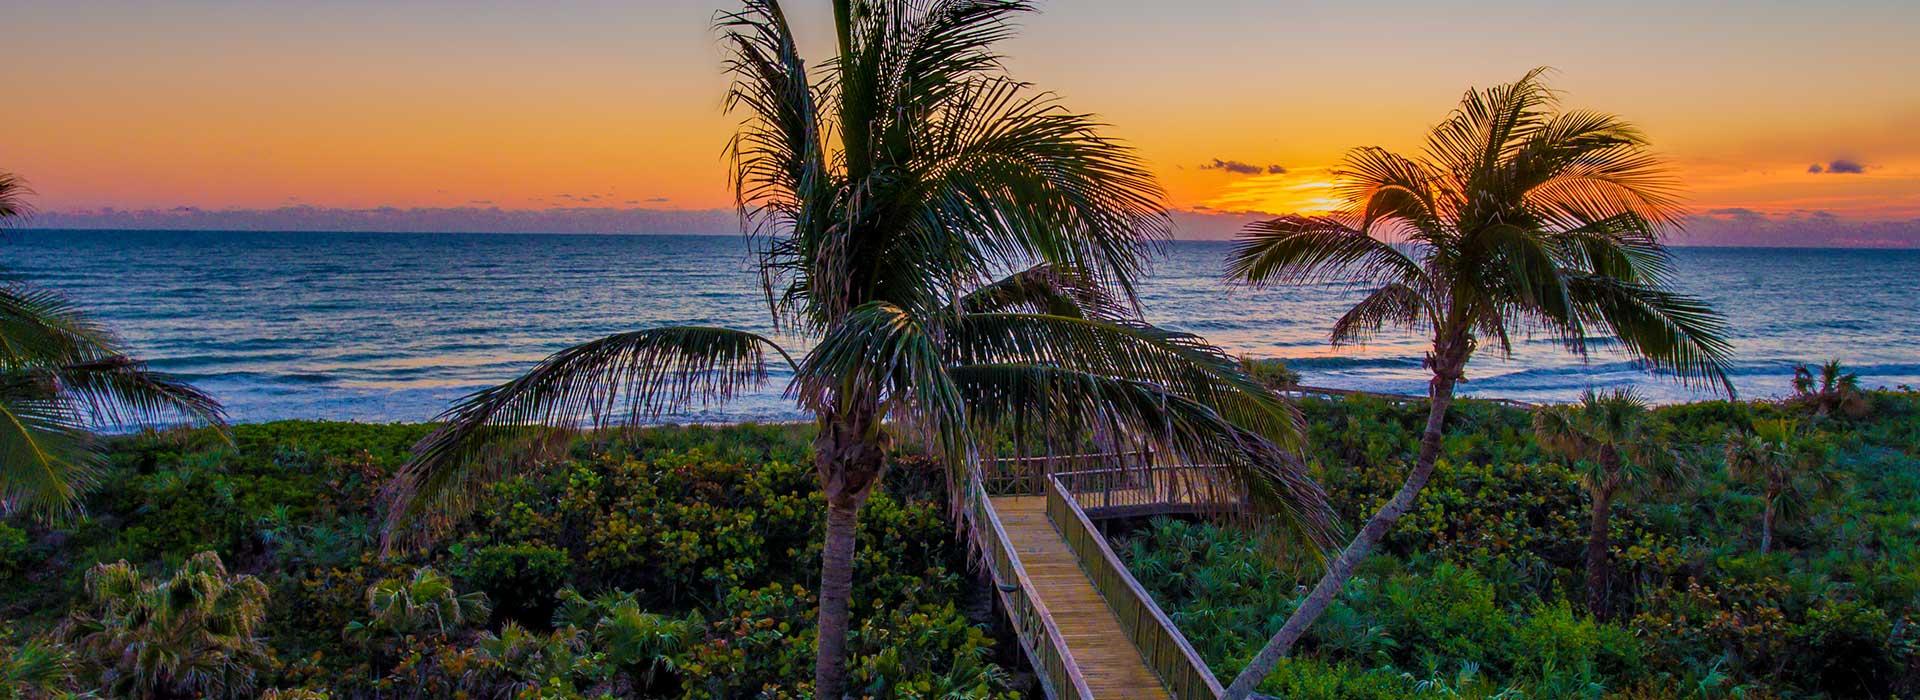 Orchid Island Sunset Beach Walk